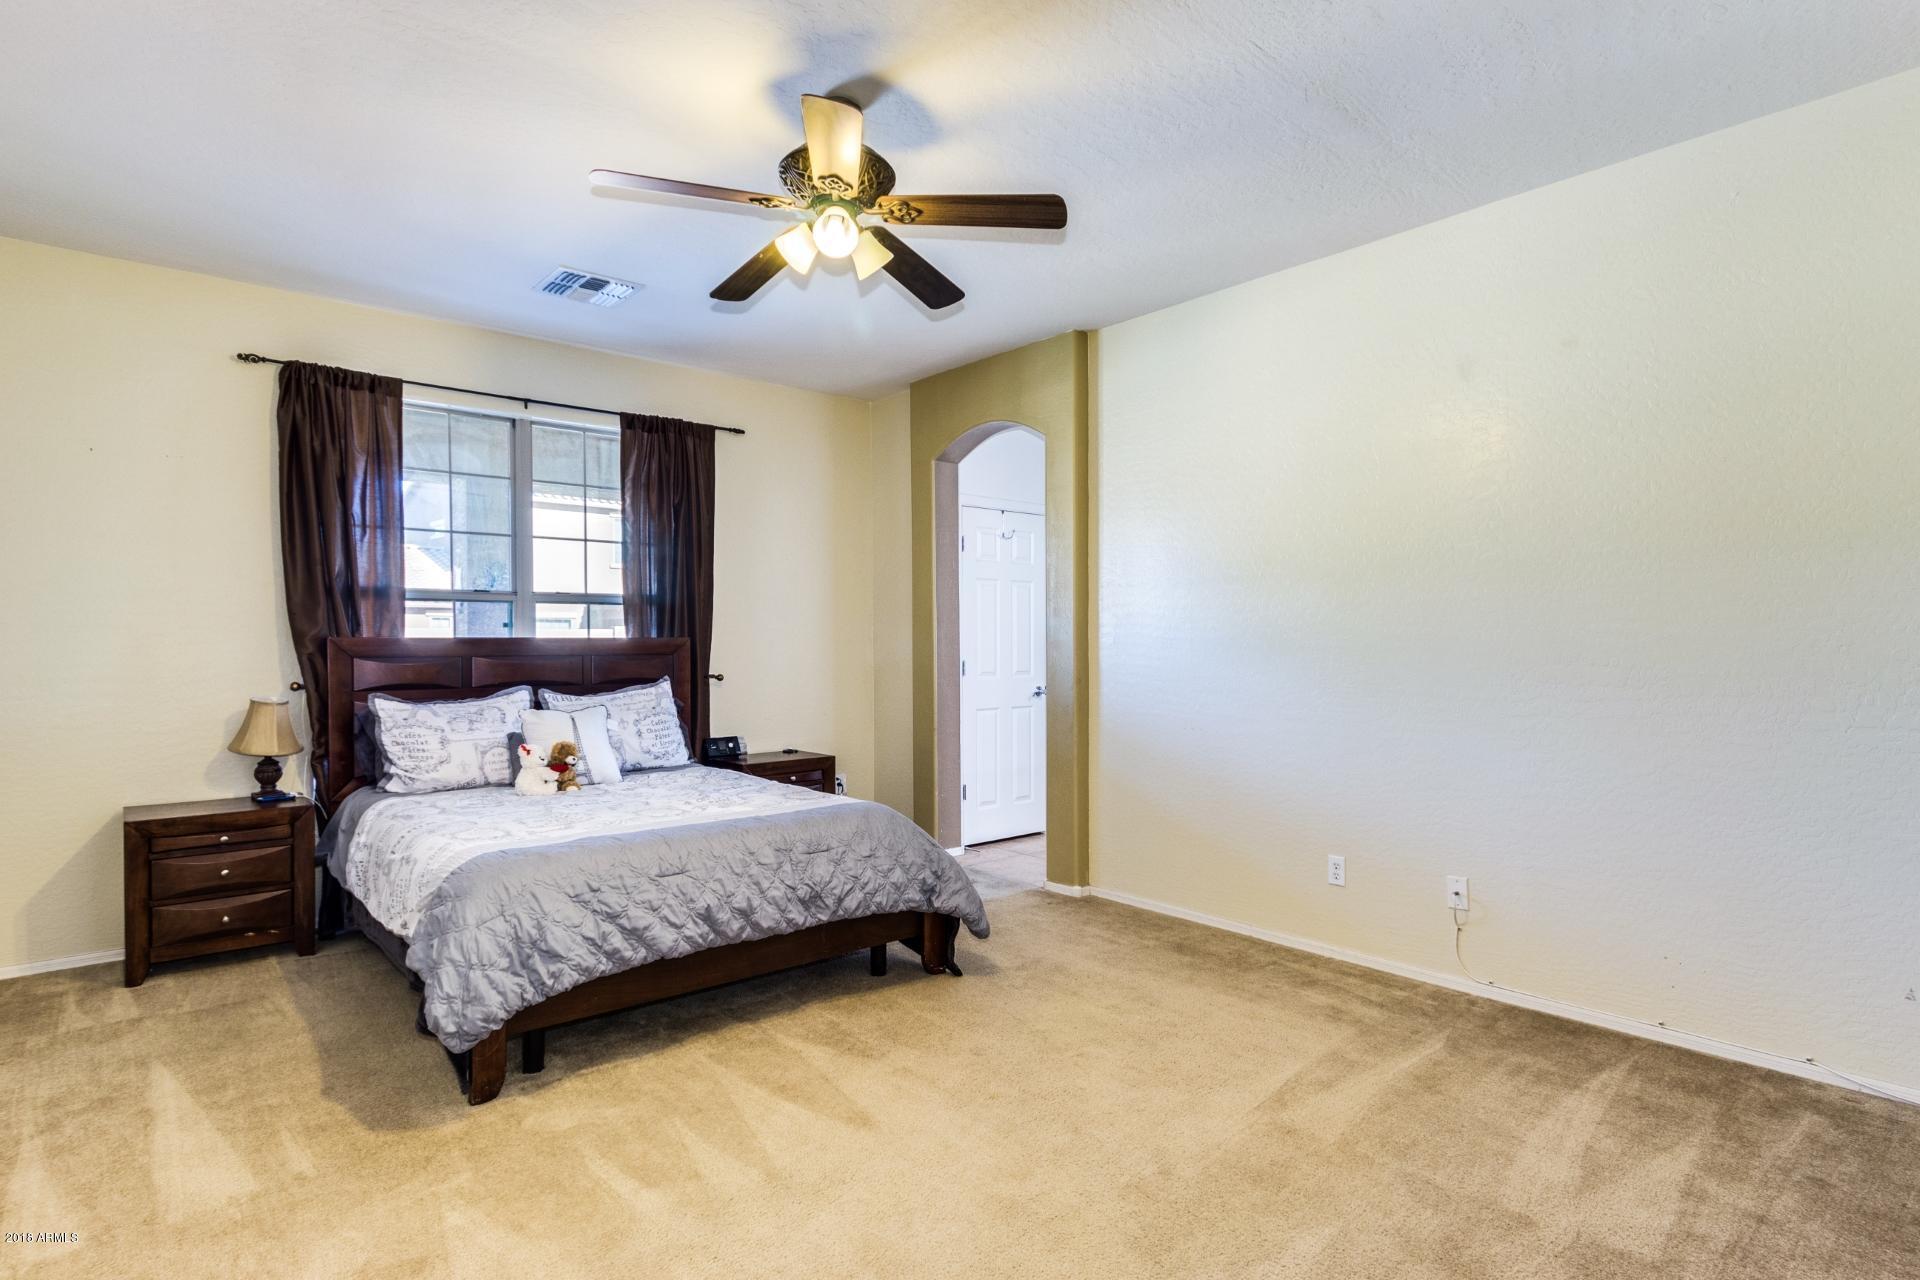 16000 W Hualapai Street Goodyear, AZ 85338 - MLS #: 5853701